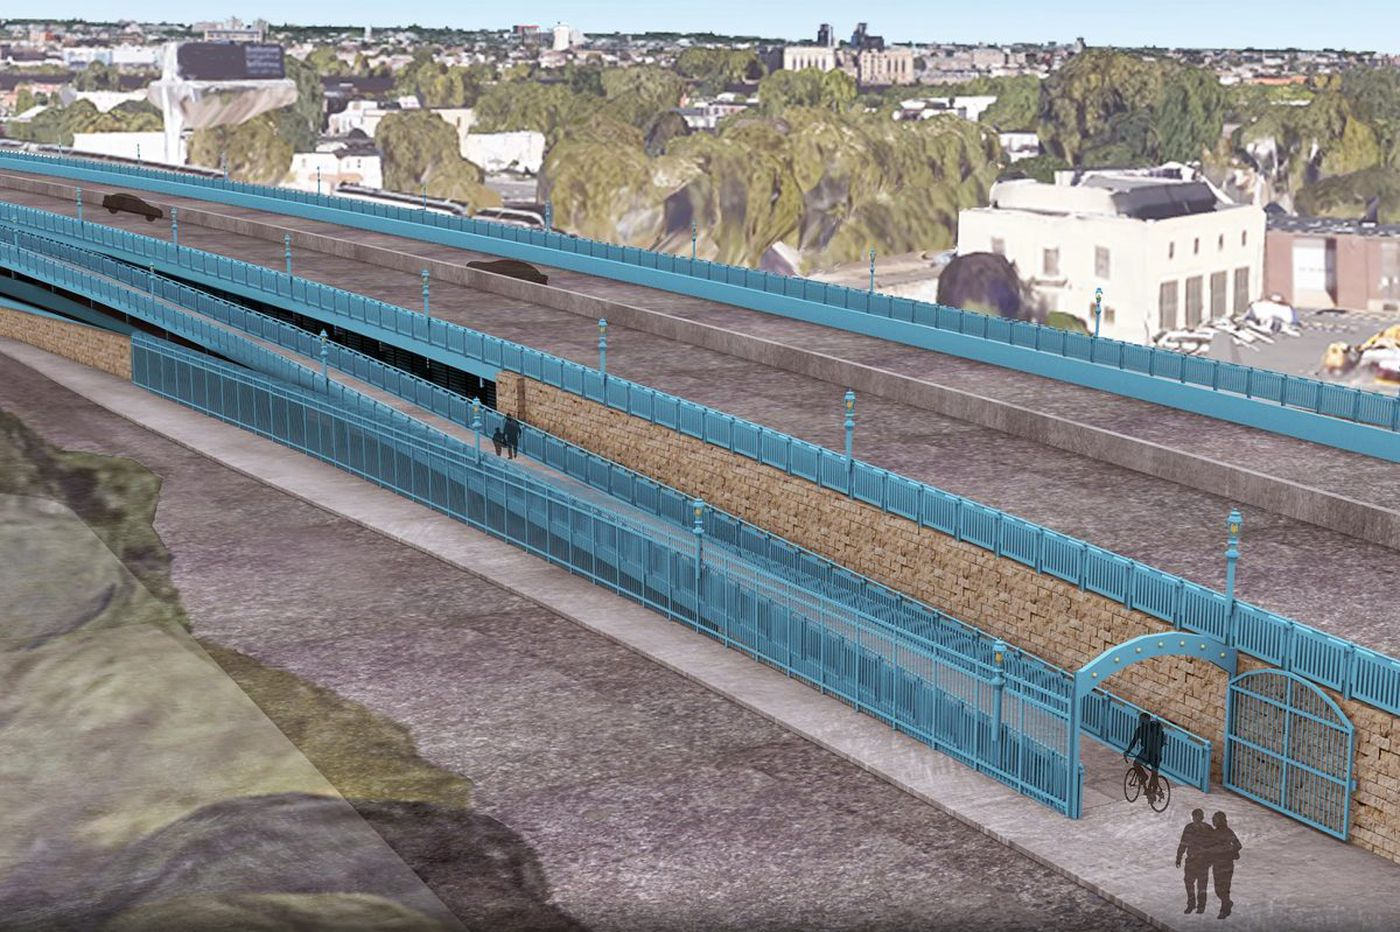 Bicycle ramp coming to Ben Franklin Bridge in 2019